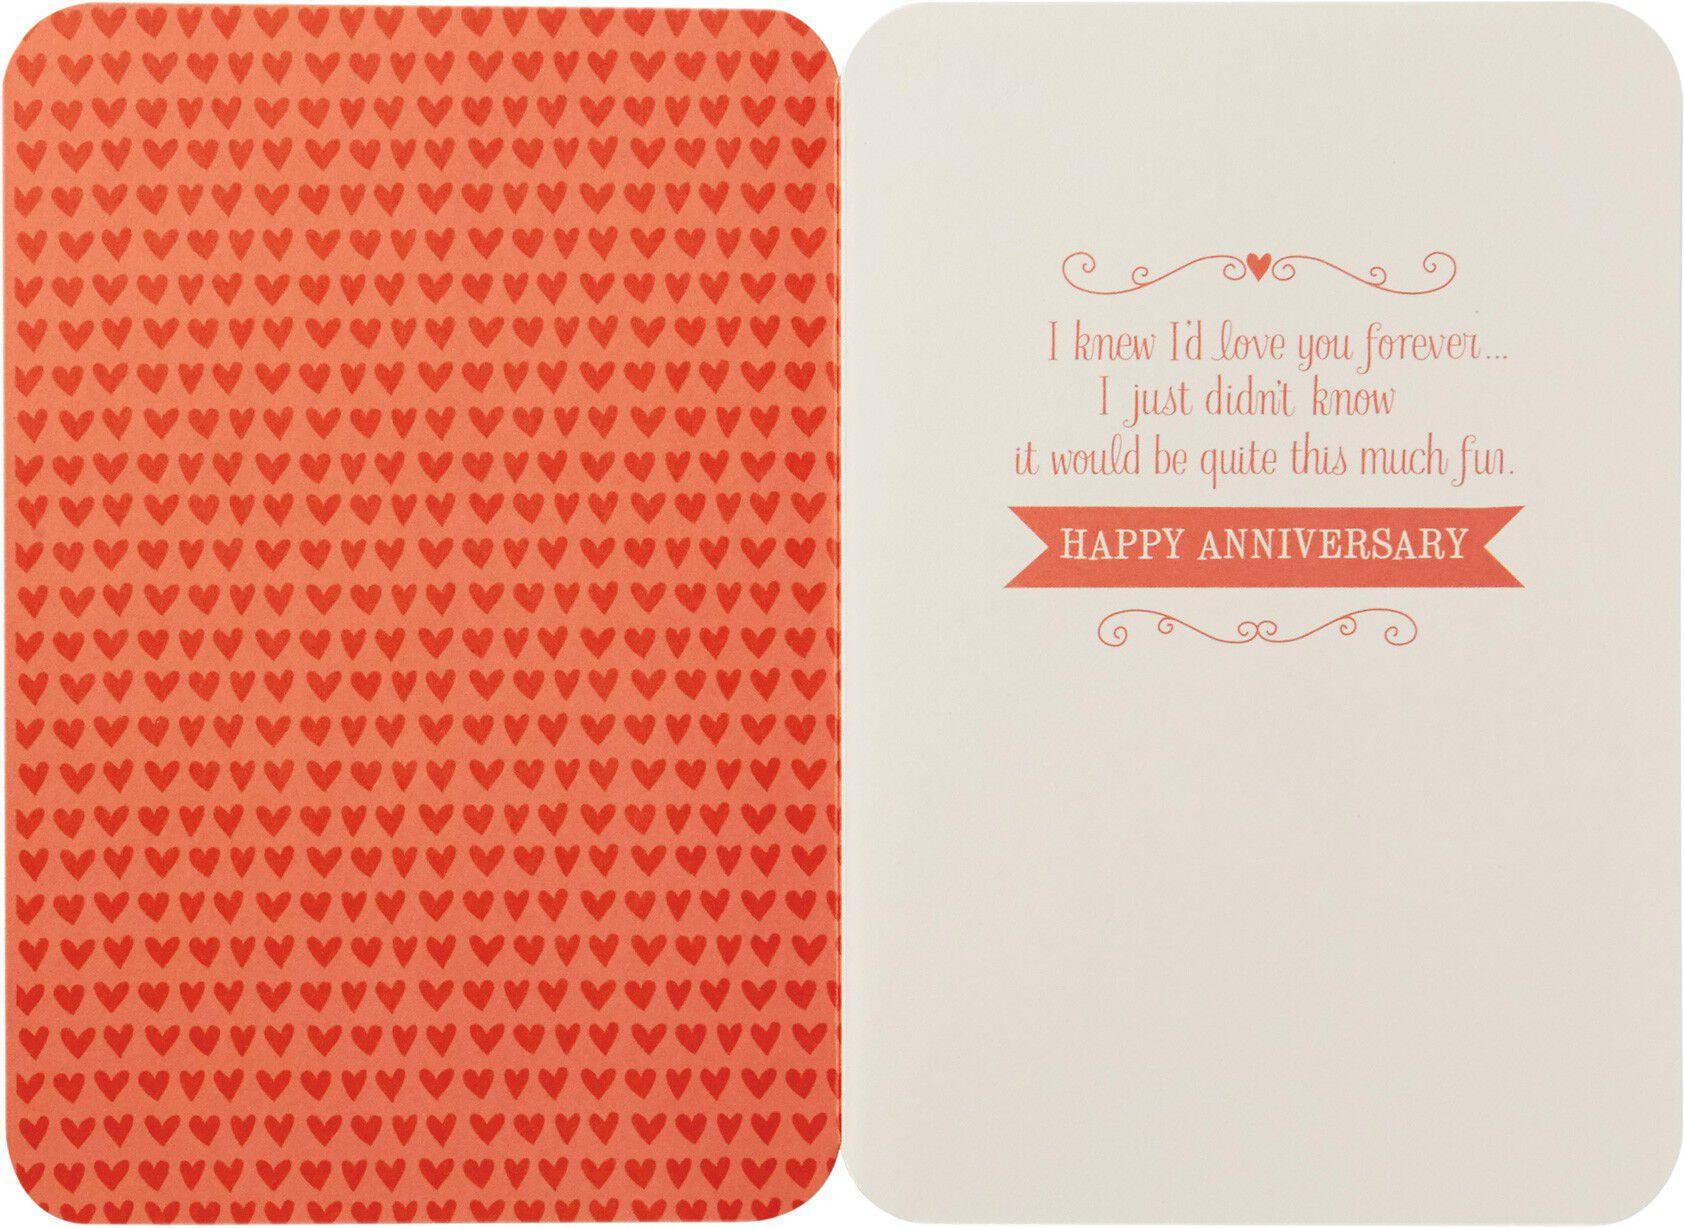 Hallmark Wedding Anniversary Gifts: Signature Collection Cards